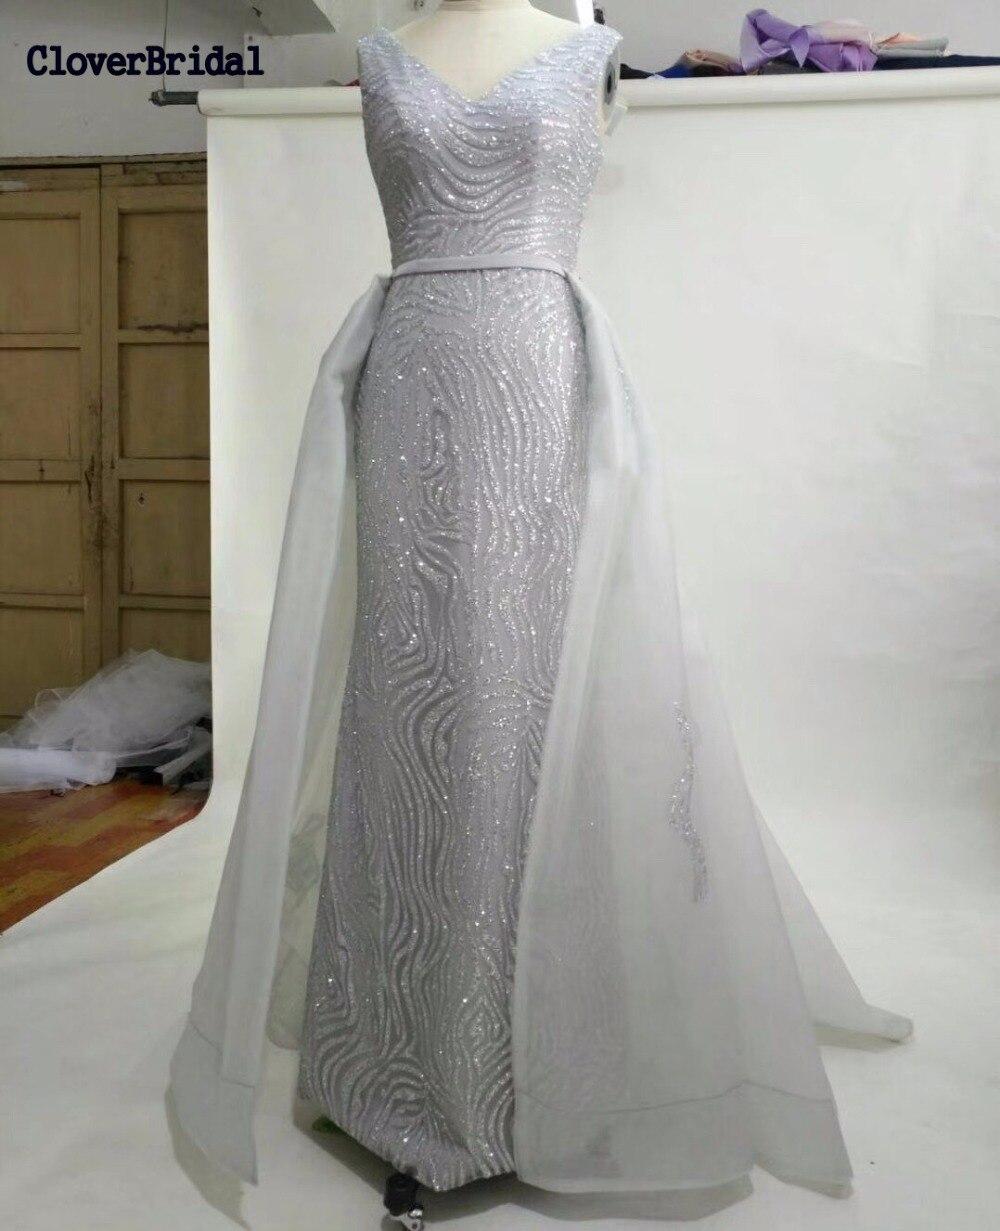 CloverBridal 2017 nowa syrenka długi pociąg srebrny sukienka dla graduation shinning luksusowe glitter bling prom dresses with outerskirt